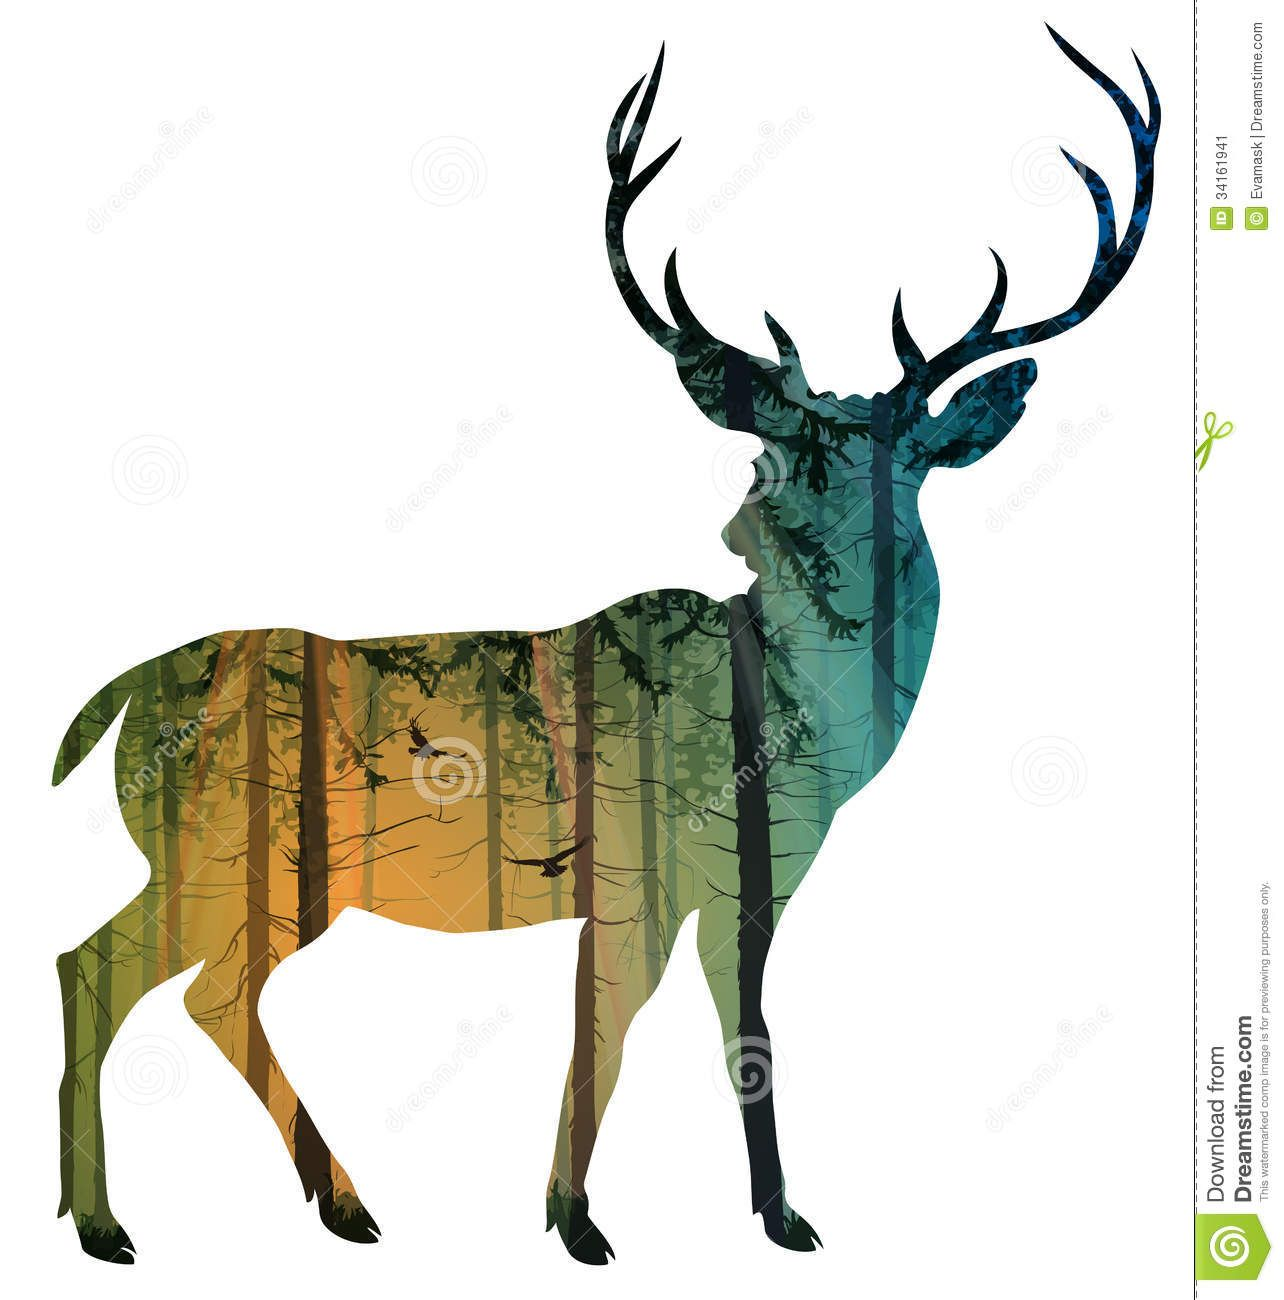 1284x1300 Deer 2 Royalty Free Stock Image